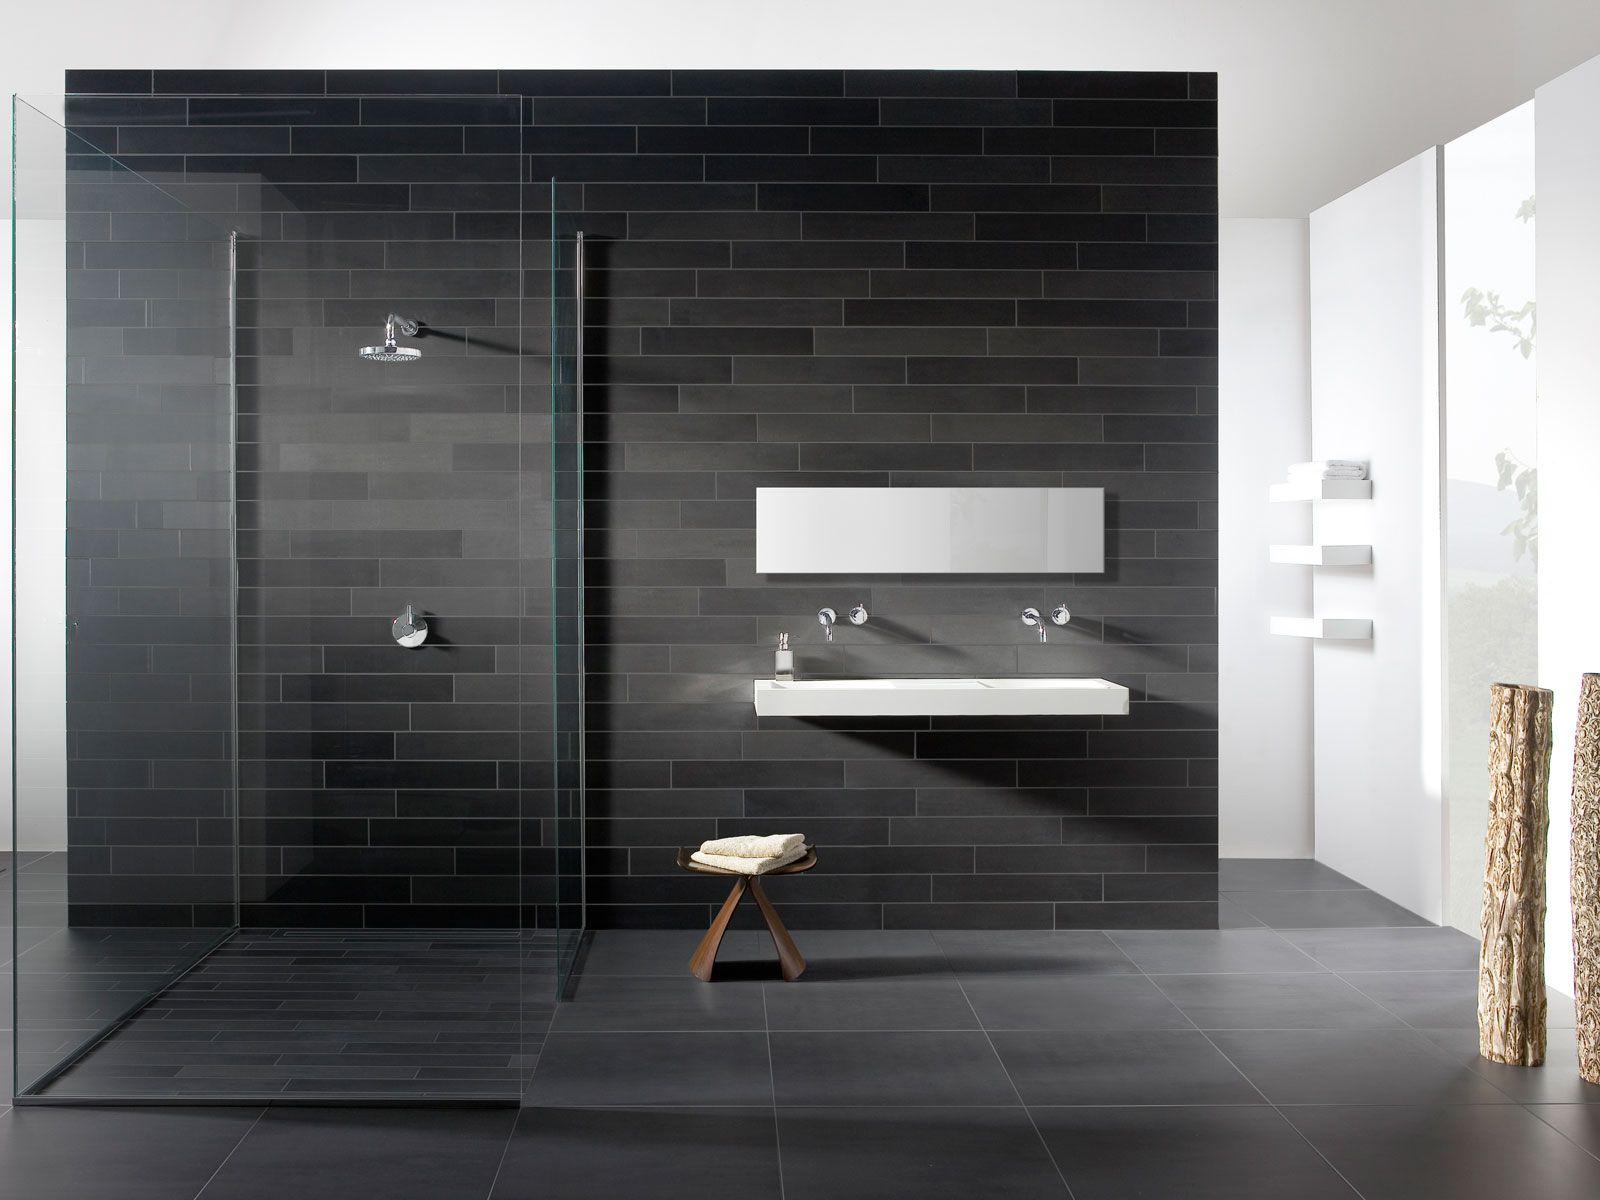 Vloertegels Badkamer Mosa : Mosa tetoc wand en vloertegels tegeltrends tegel